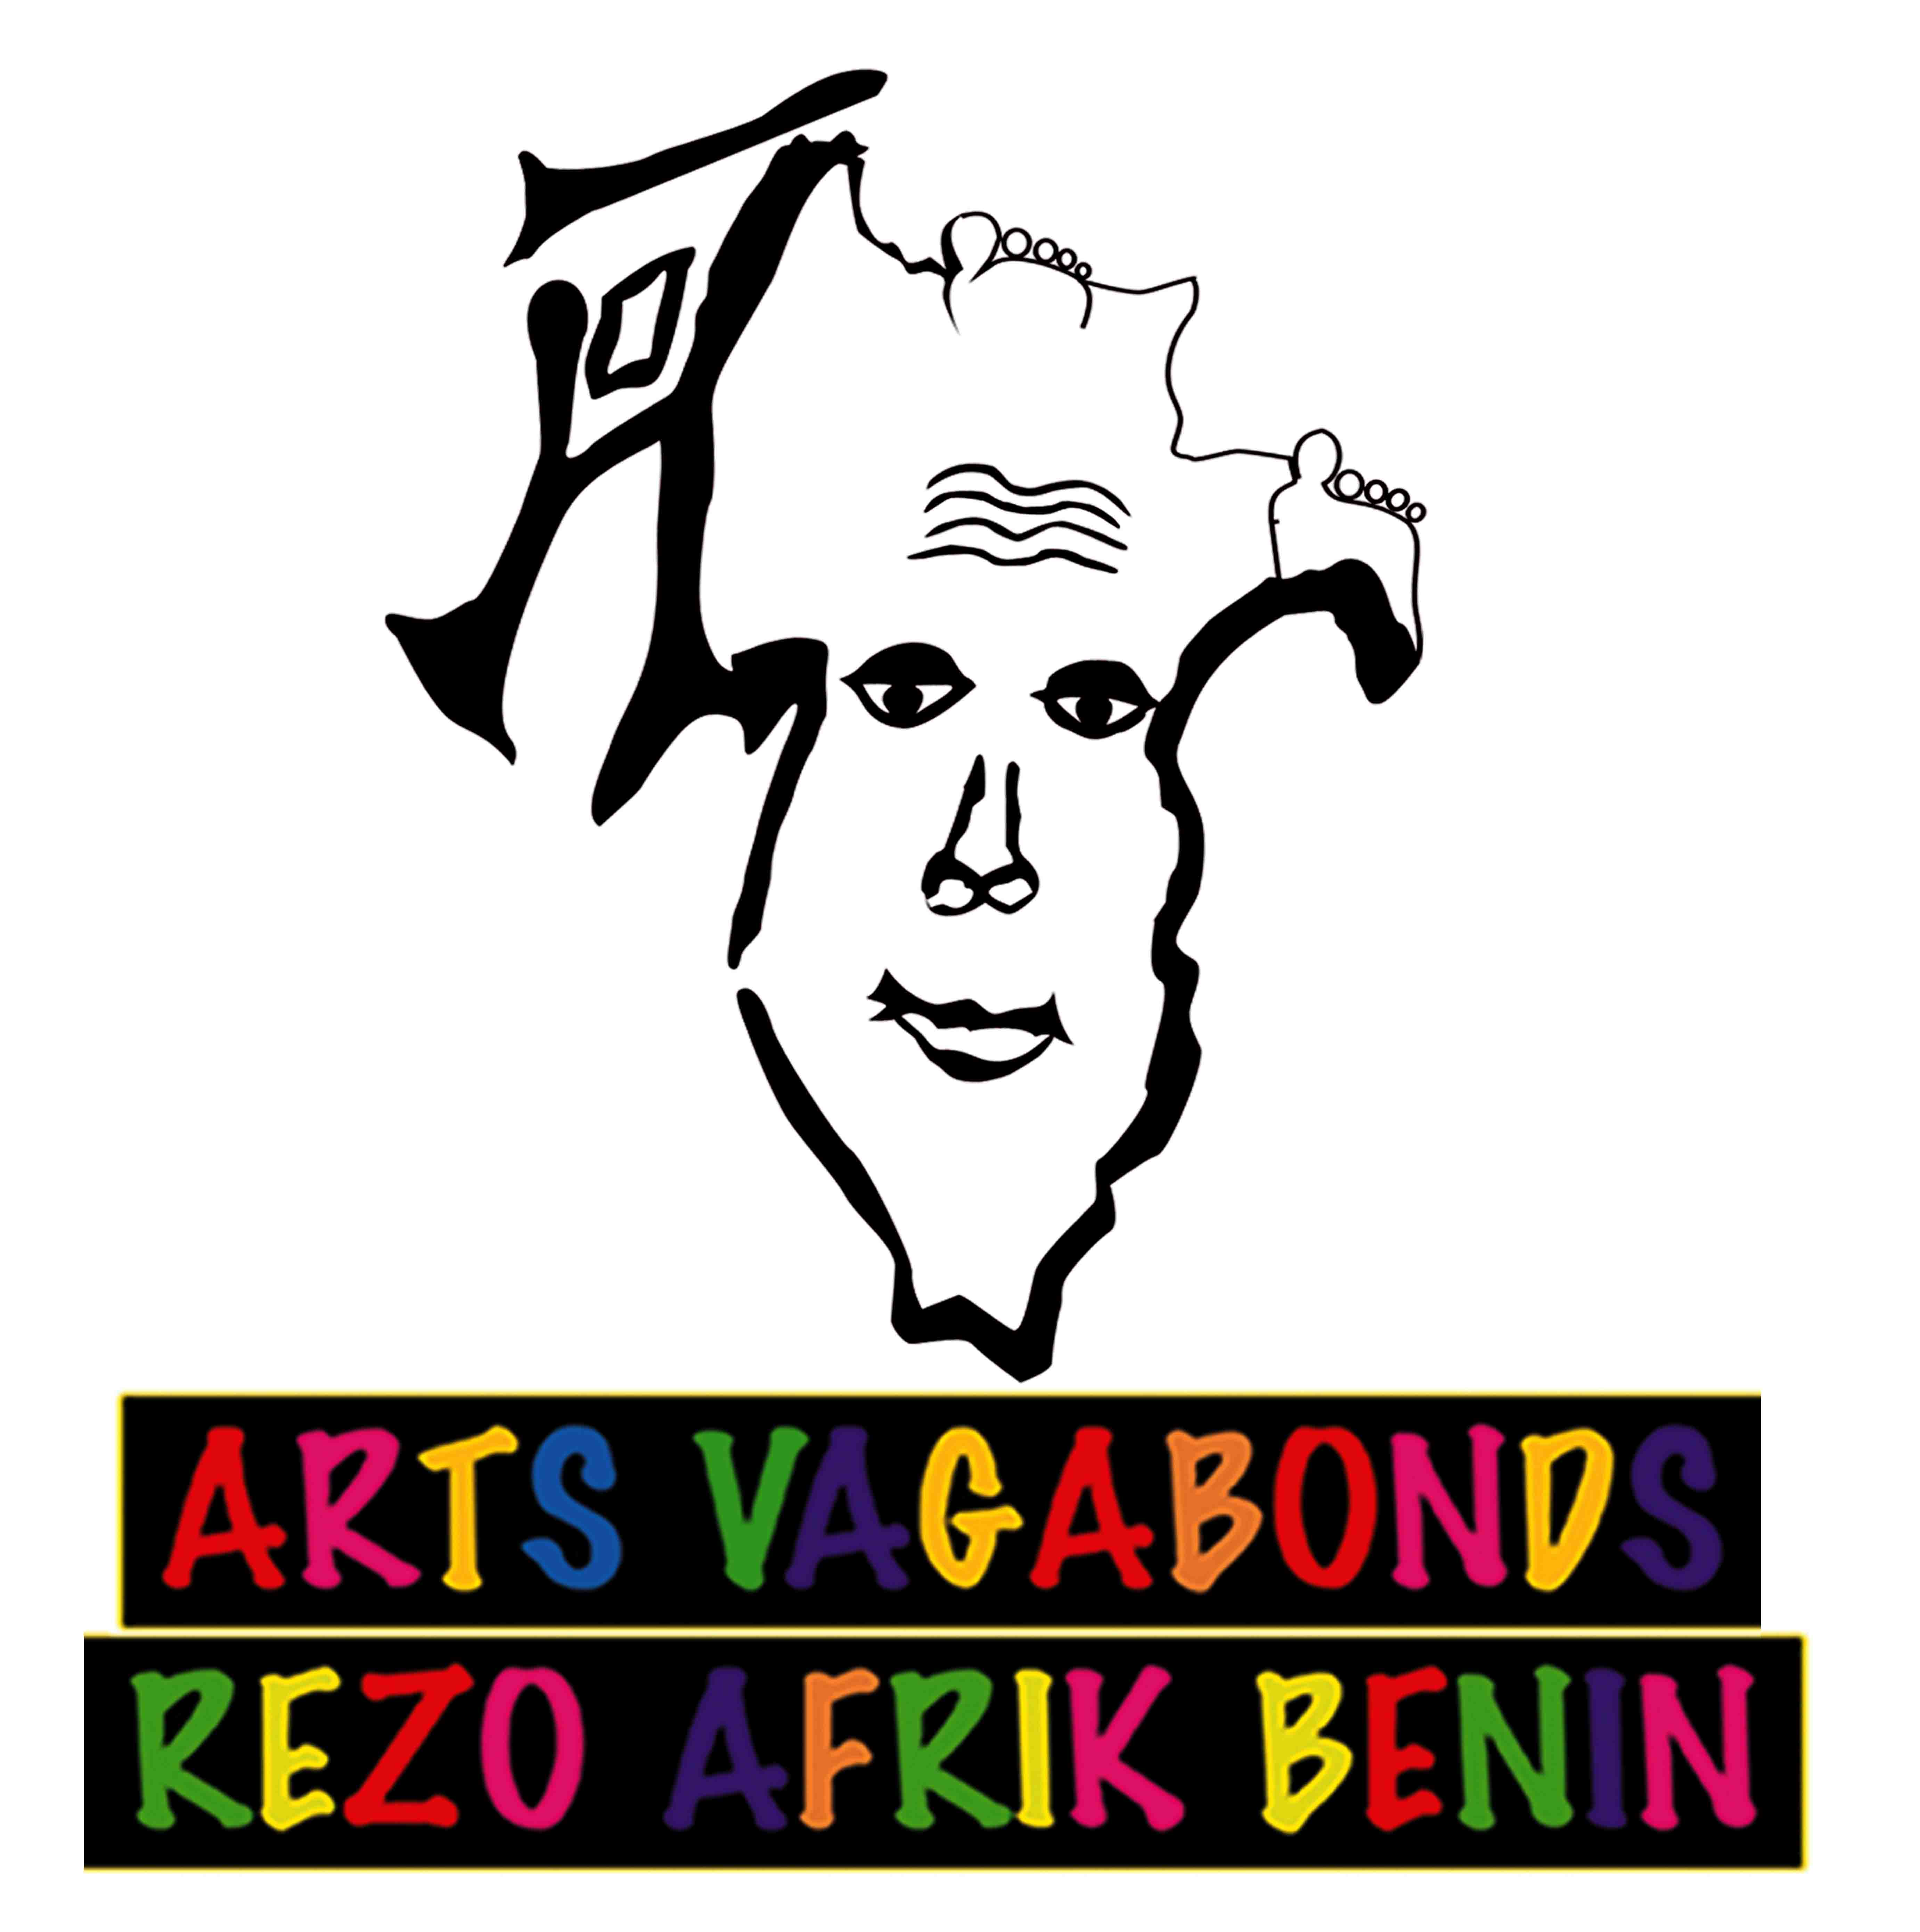 ARTS VAGABONDS REZO AFRIK BENIN